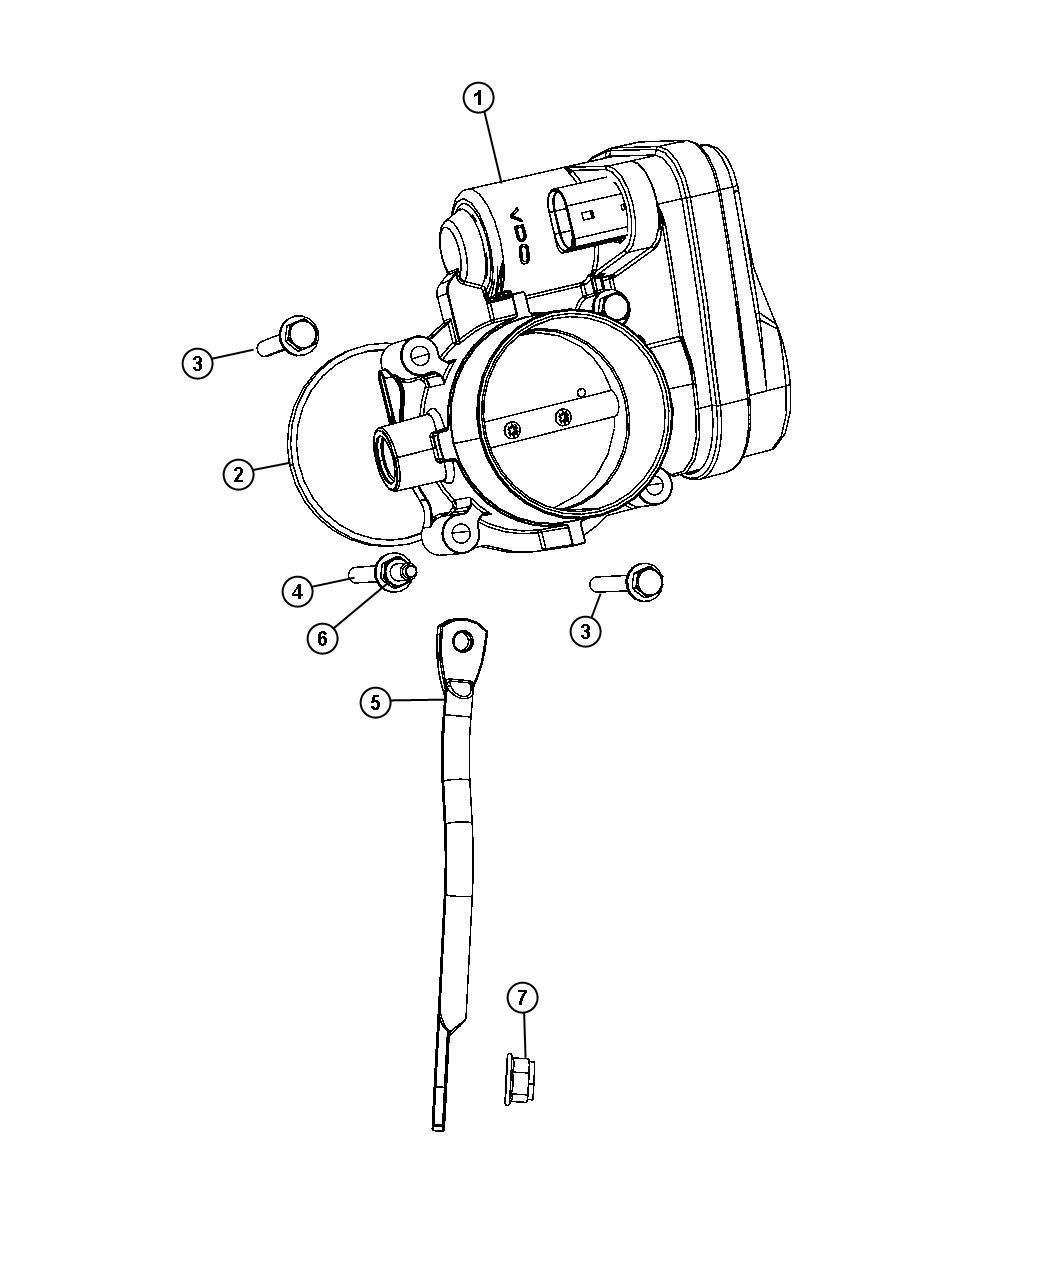 2008 Chrysler Sebring Throttle body. Intake, manifold